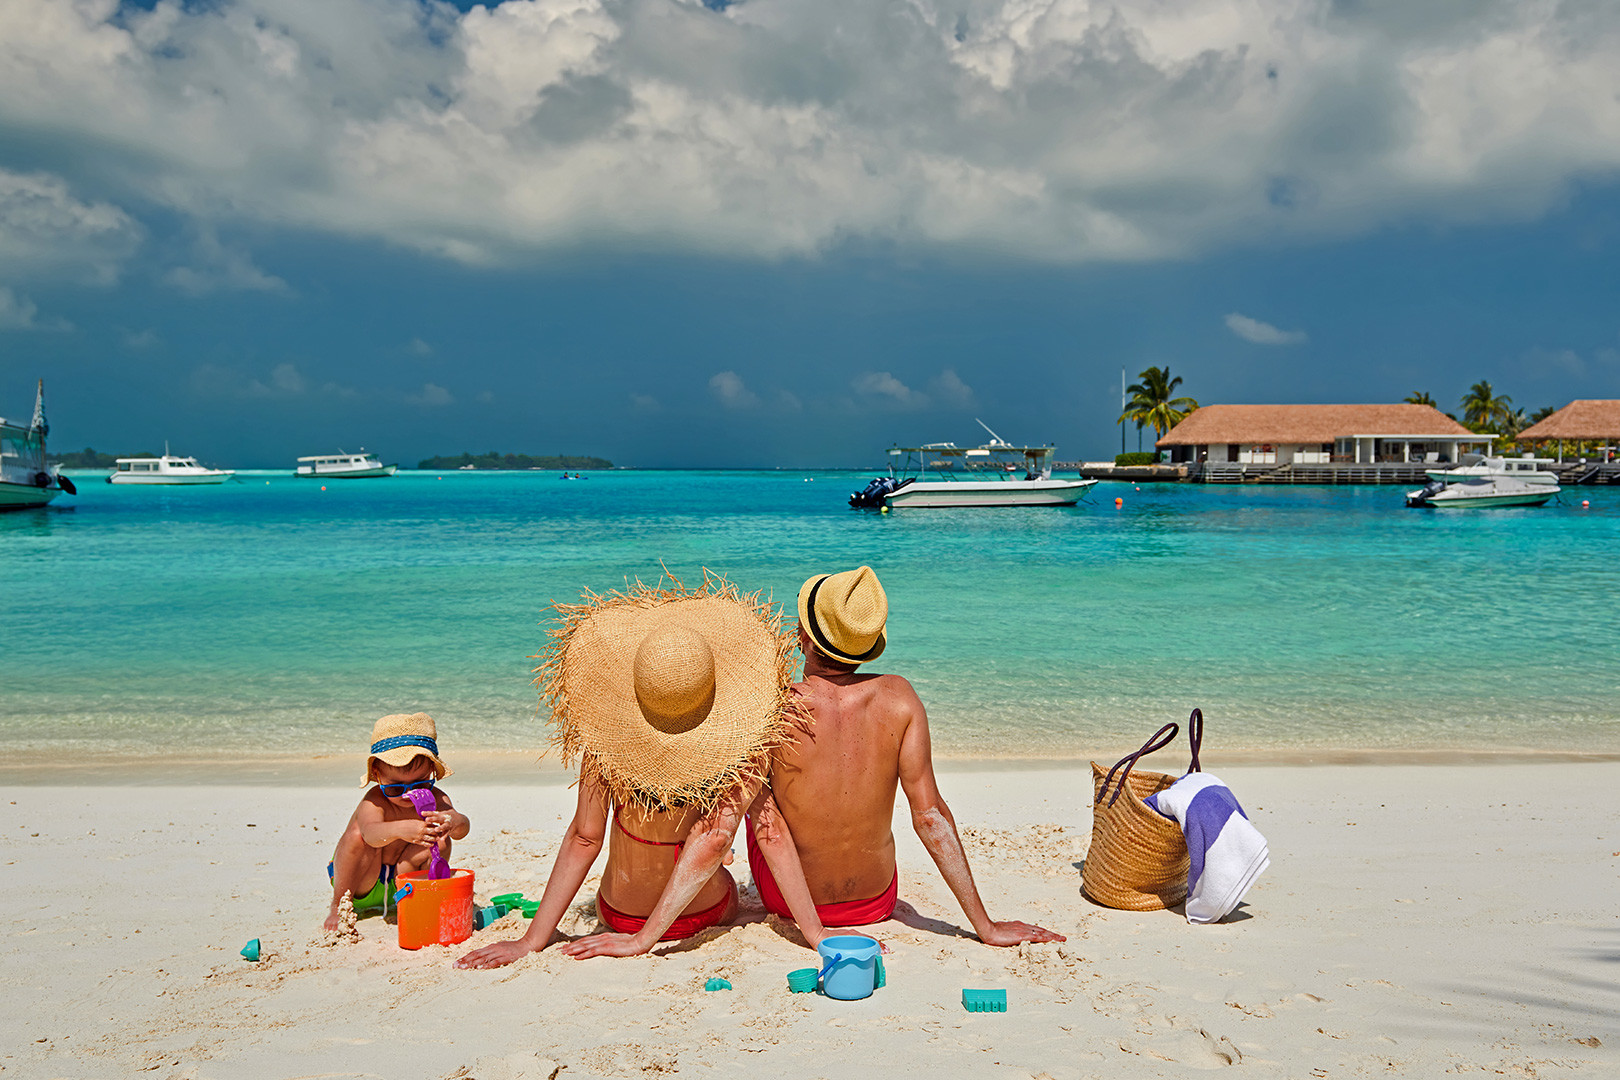 Paste 2021 - Family Experience in Dubai & Maldive, 11 zile - cu Cosmin Stan